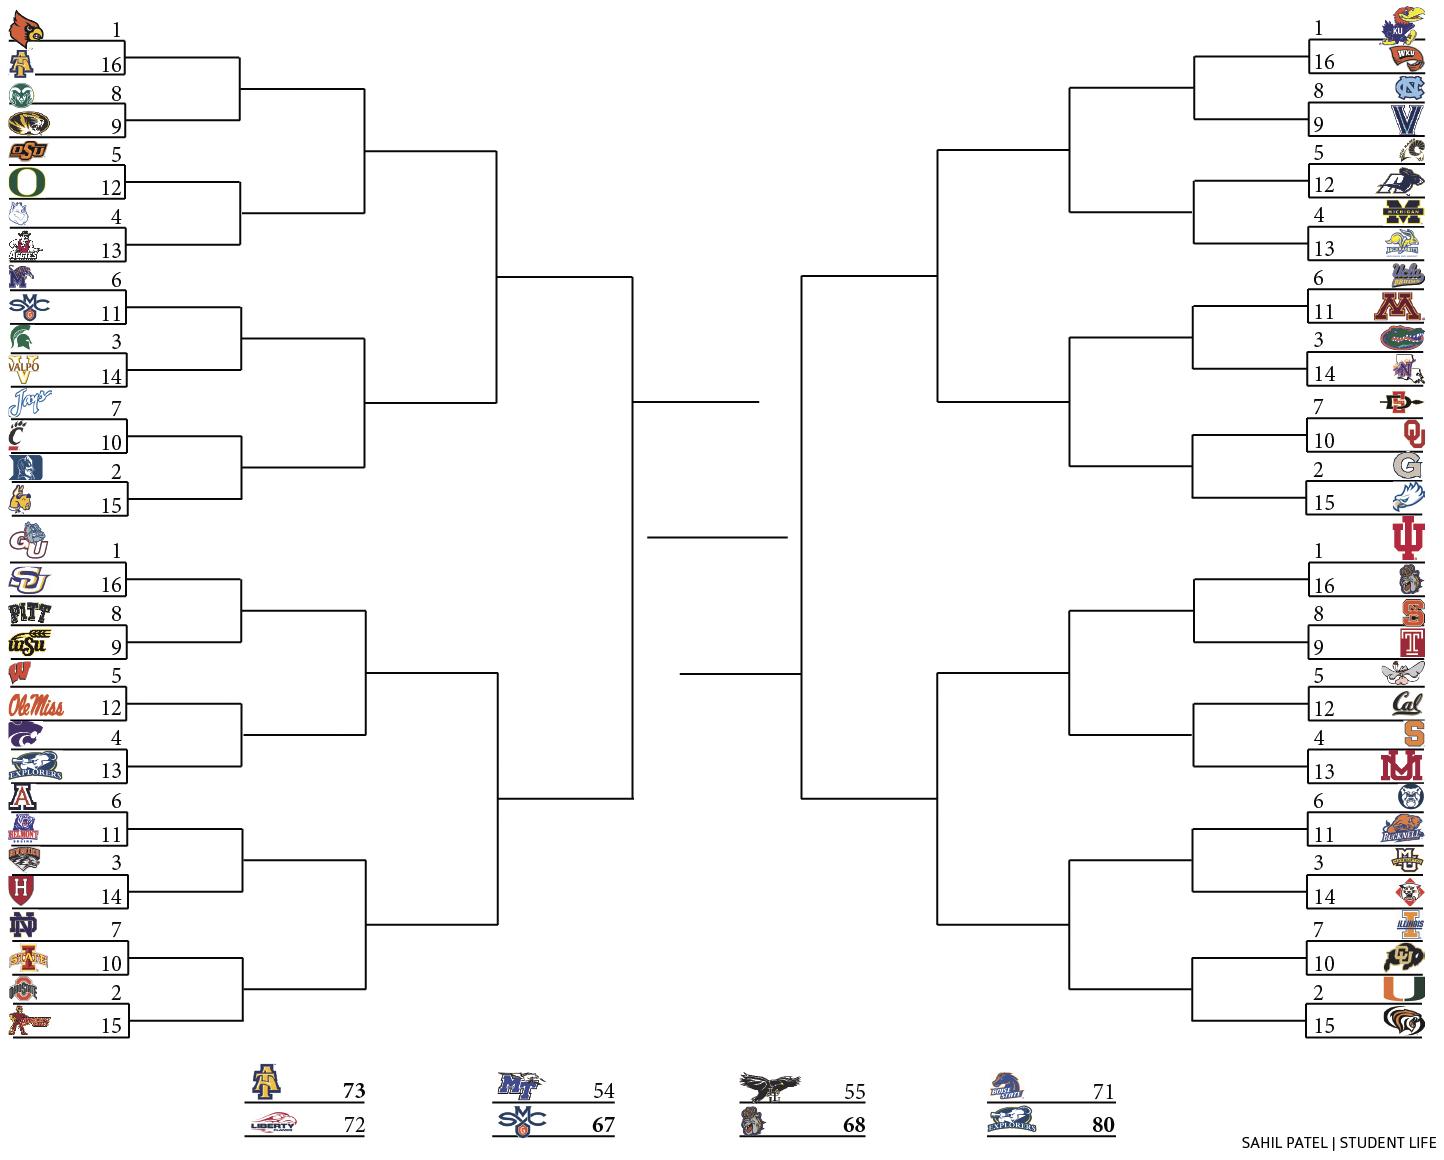 The 2013 Ncaa Division I Men S Basketball Bracket